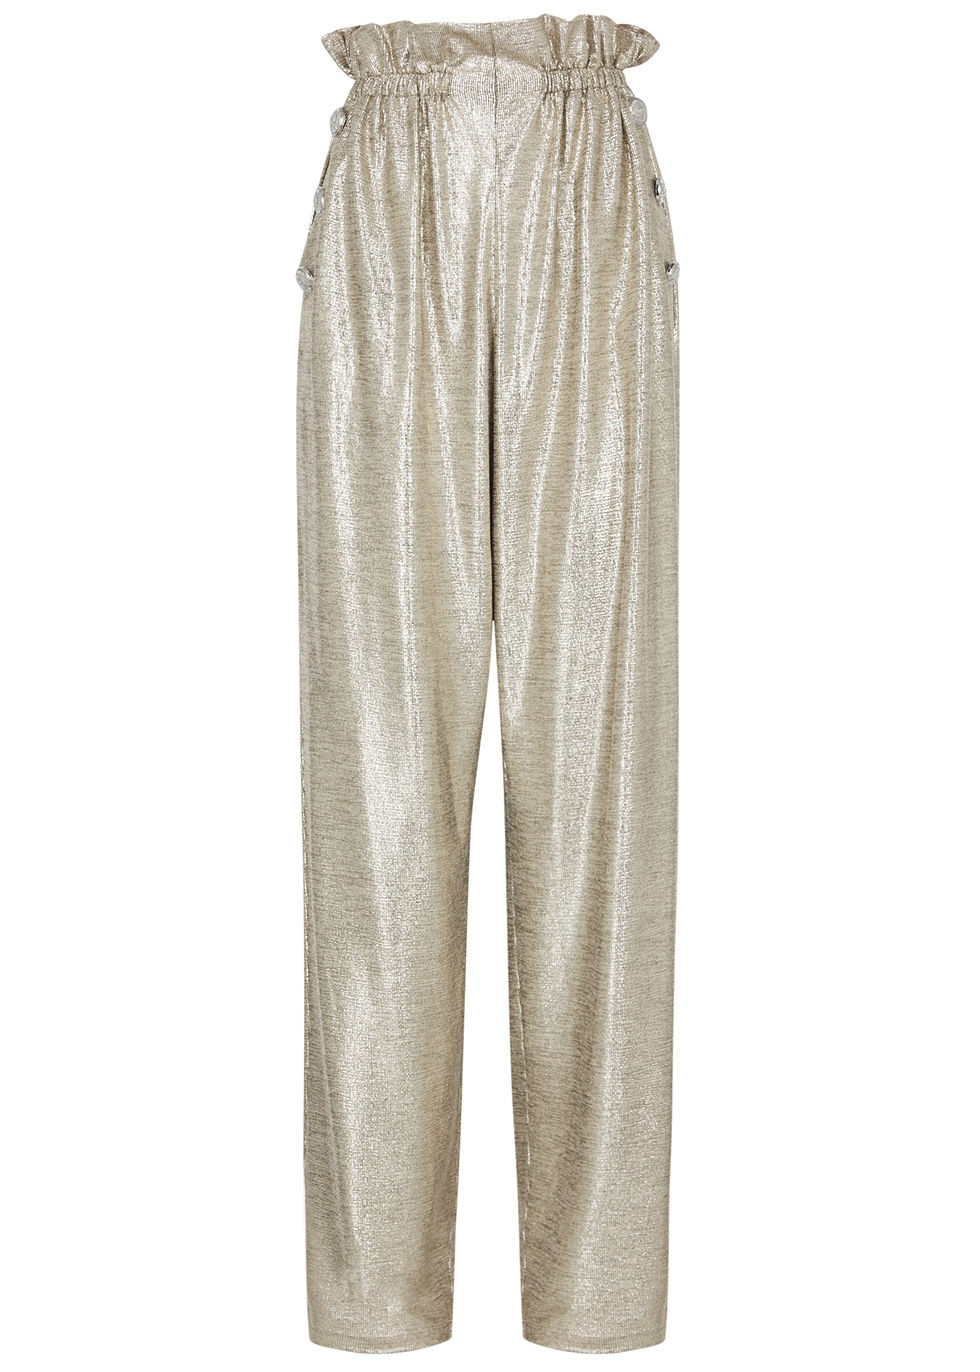 Silver wide-leg coated-knit trousers - Balmain